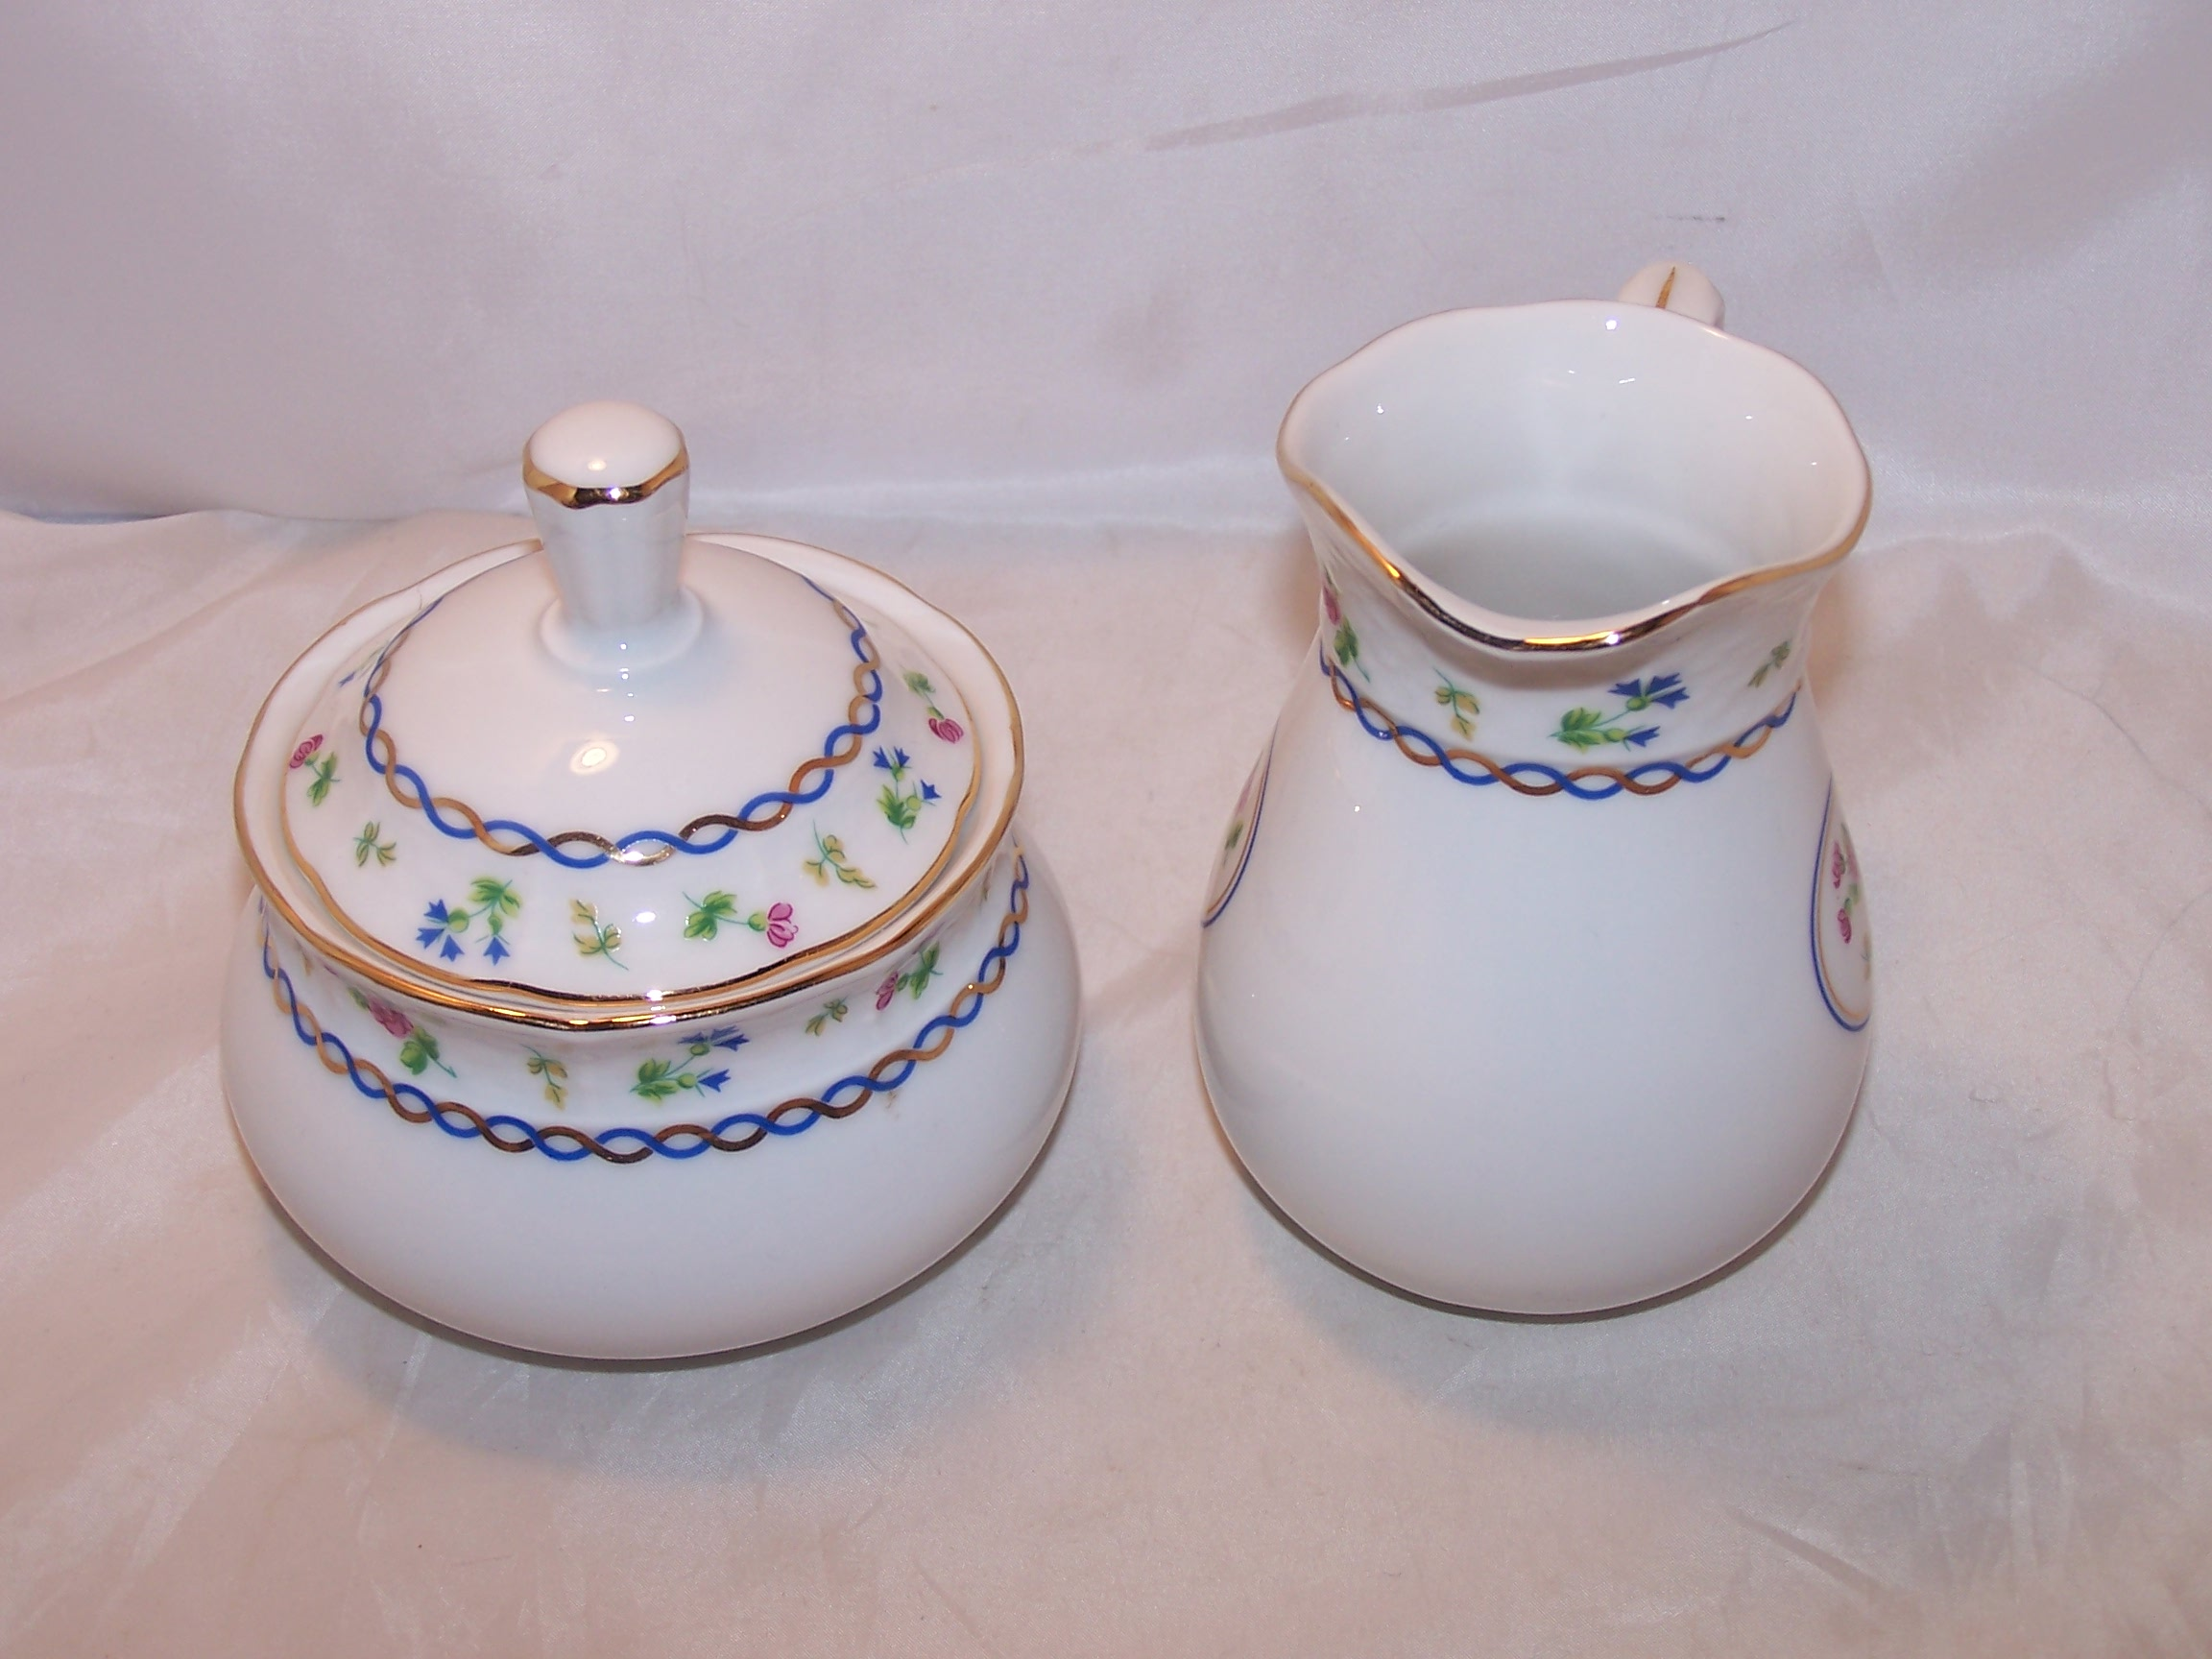 Image 3 of Baum Bros Thun Porcelain Creamer and Sugar, Czechoslovakia